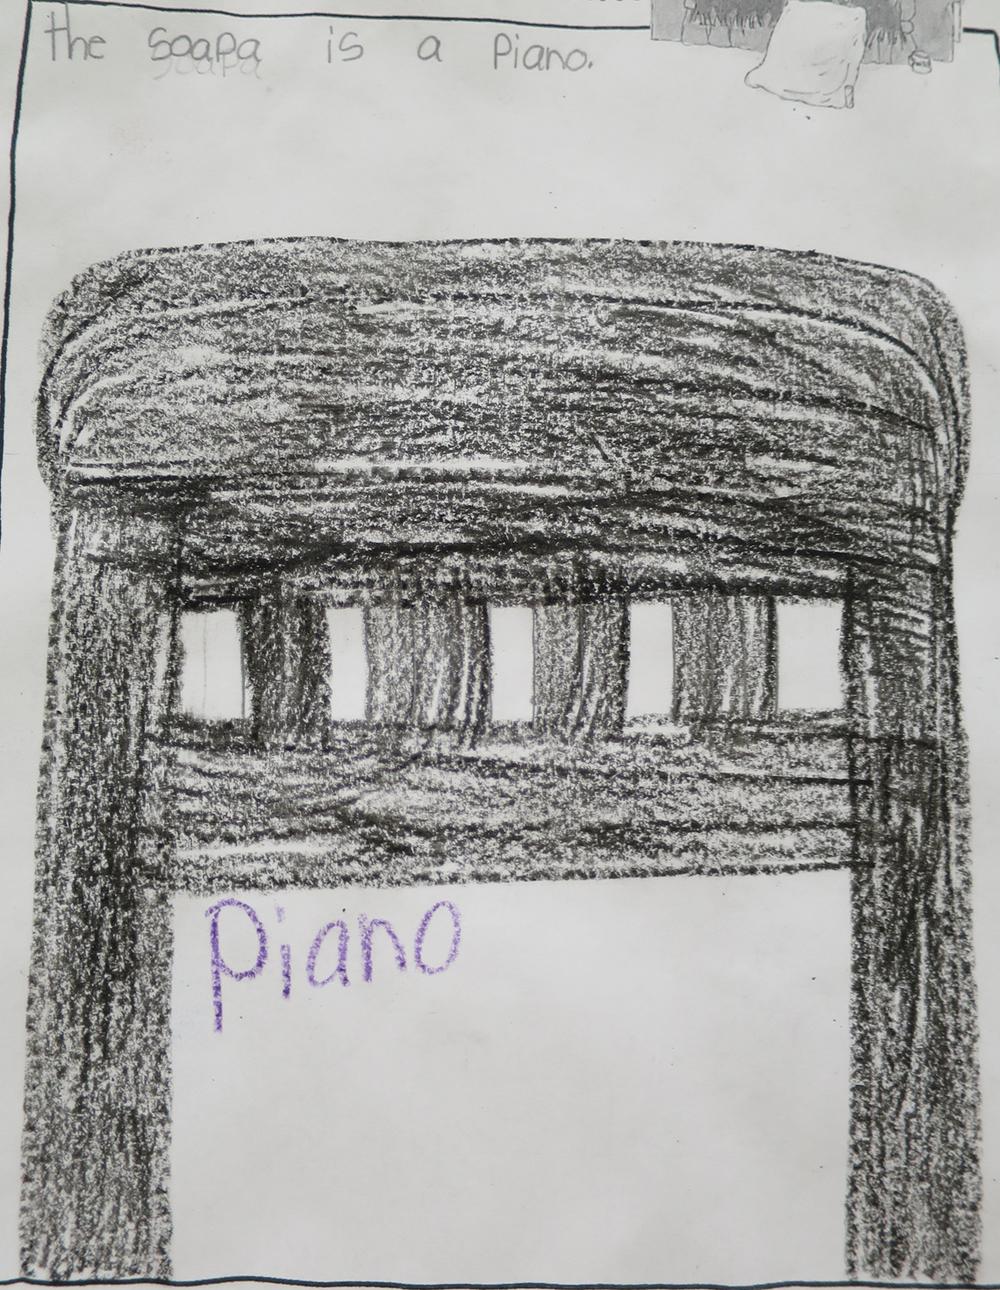 sofa is a piano72.jpg